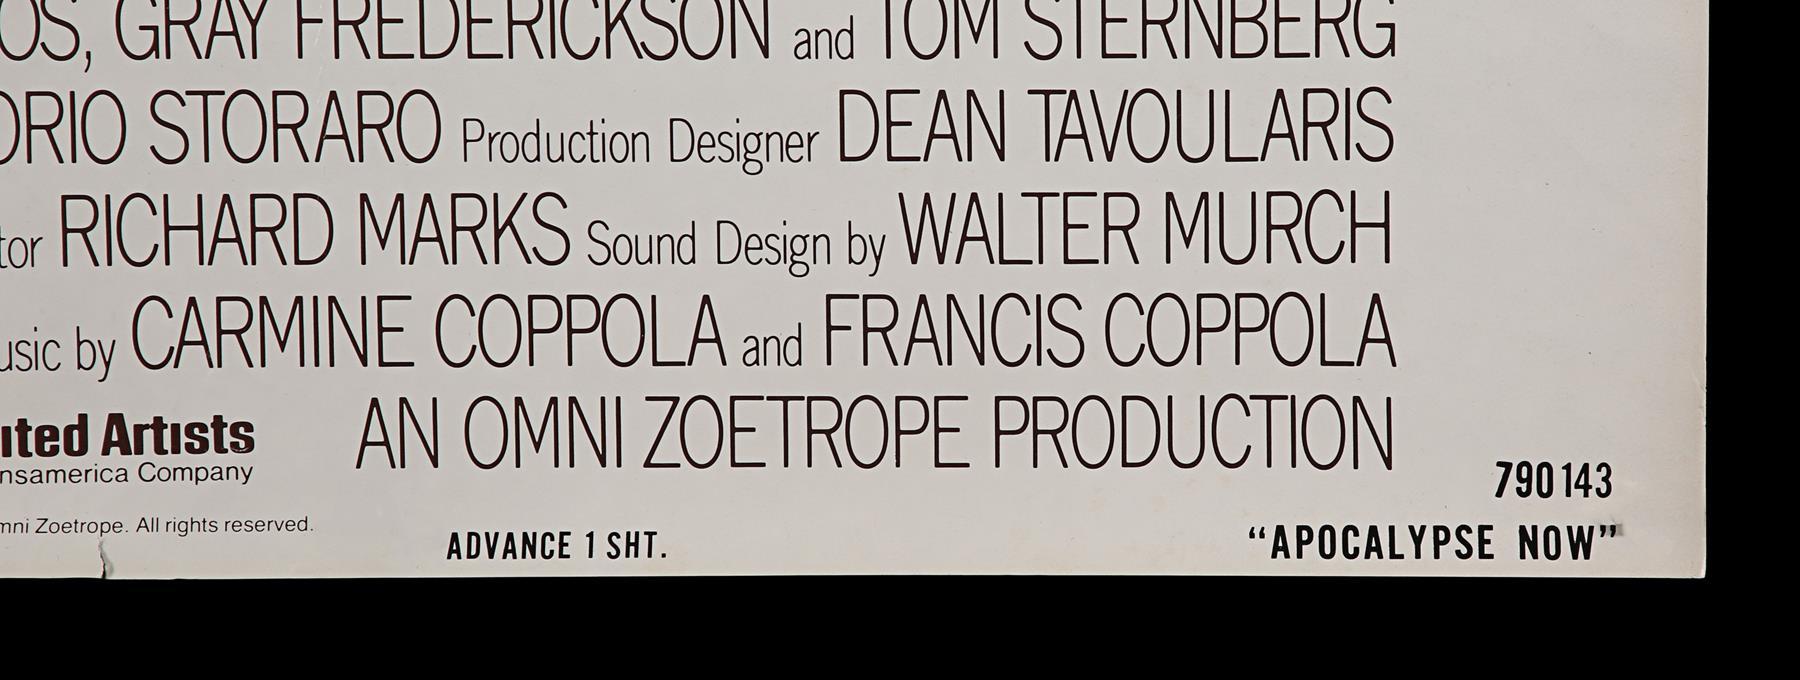 APOCALYPSE NOW (1979) - US One-Sheet, 1979 - Image 3 of 5